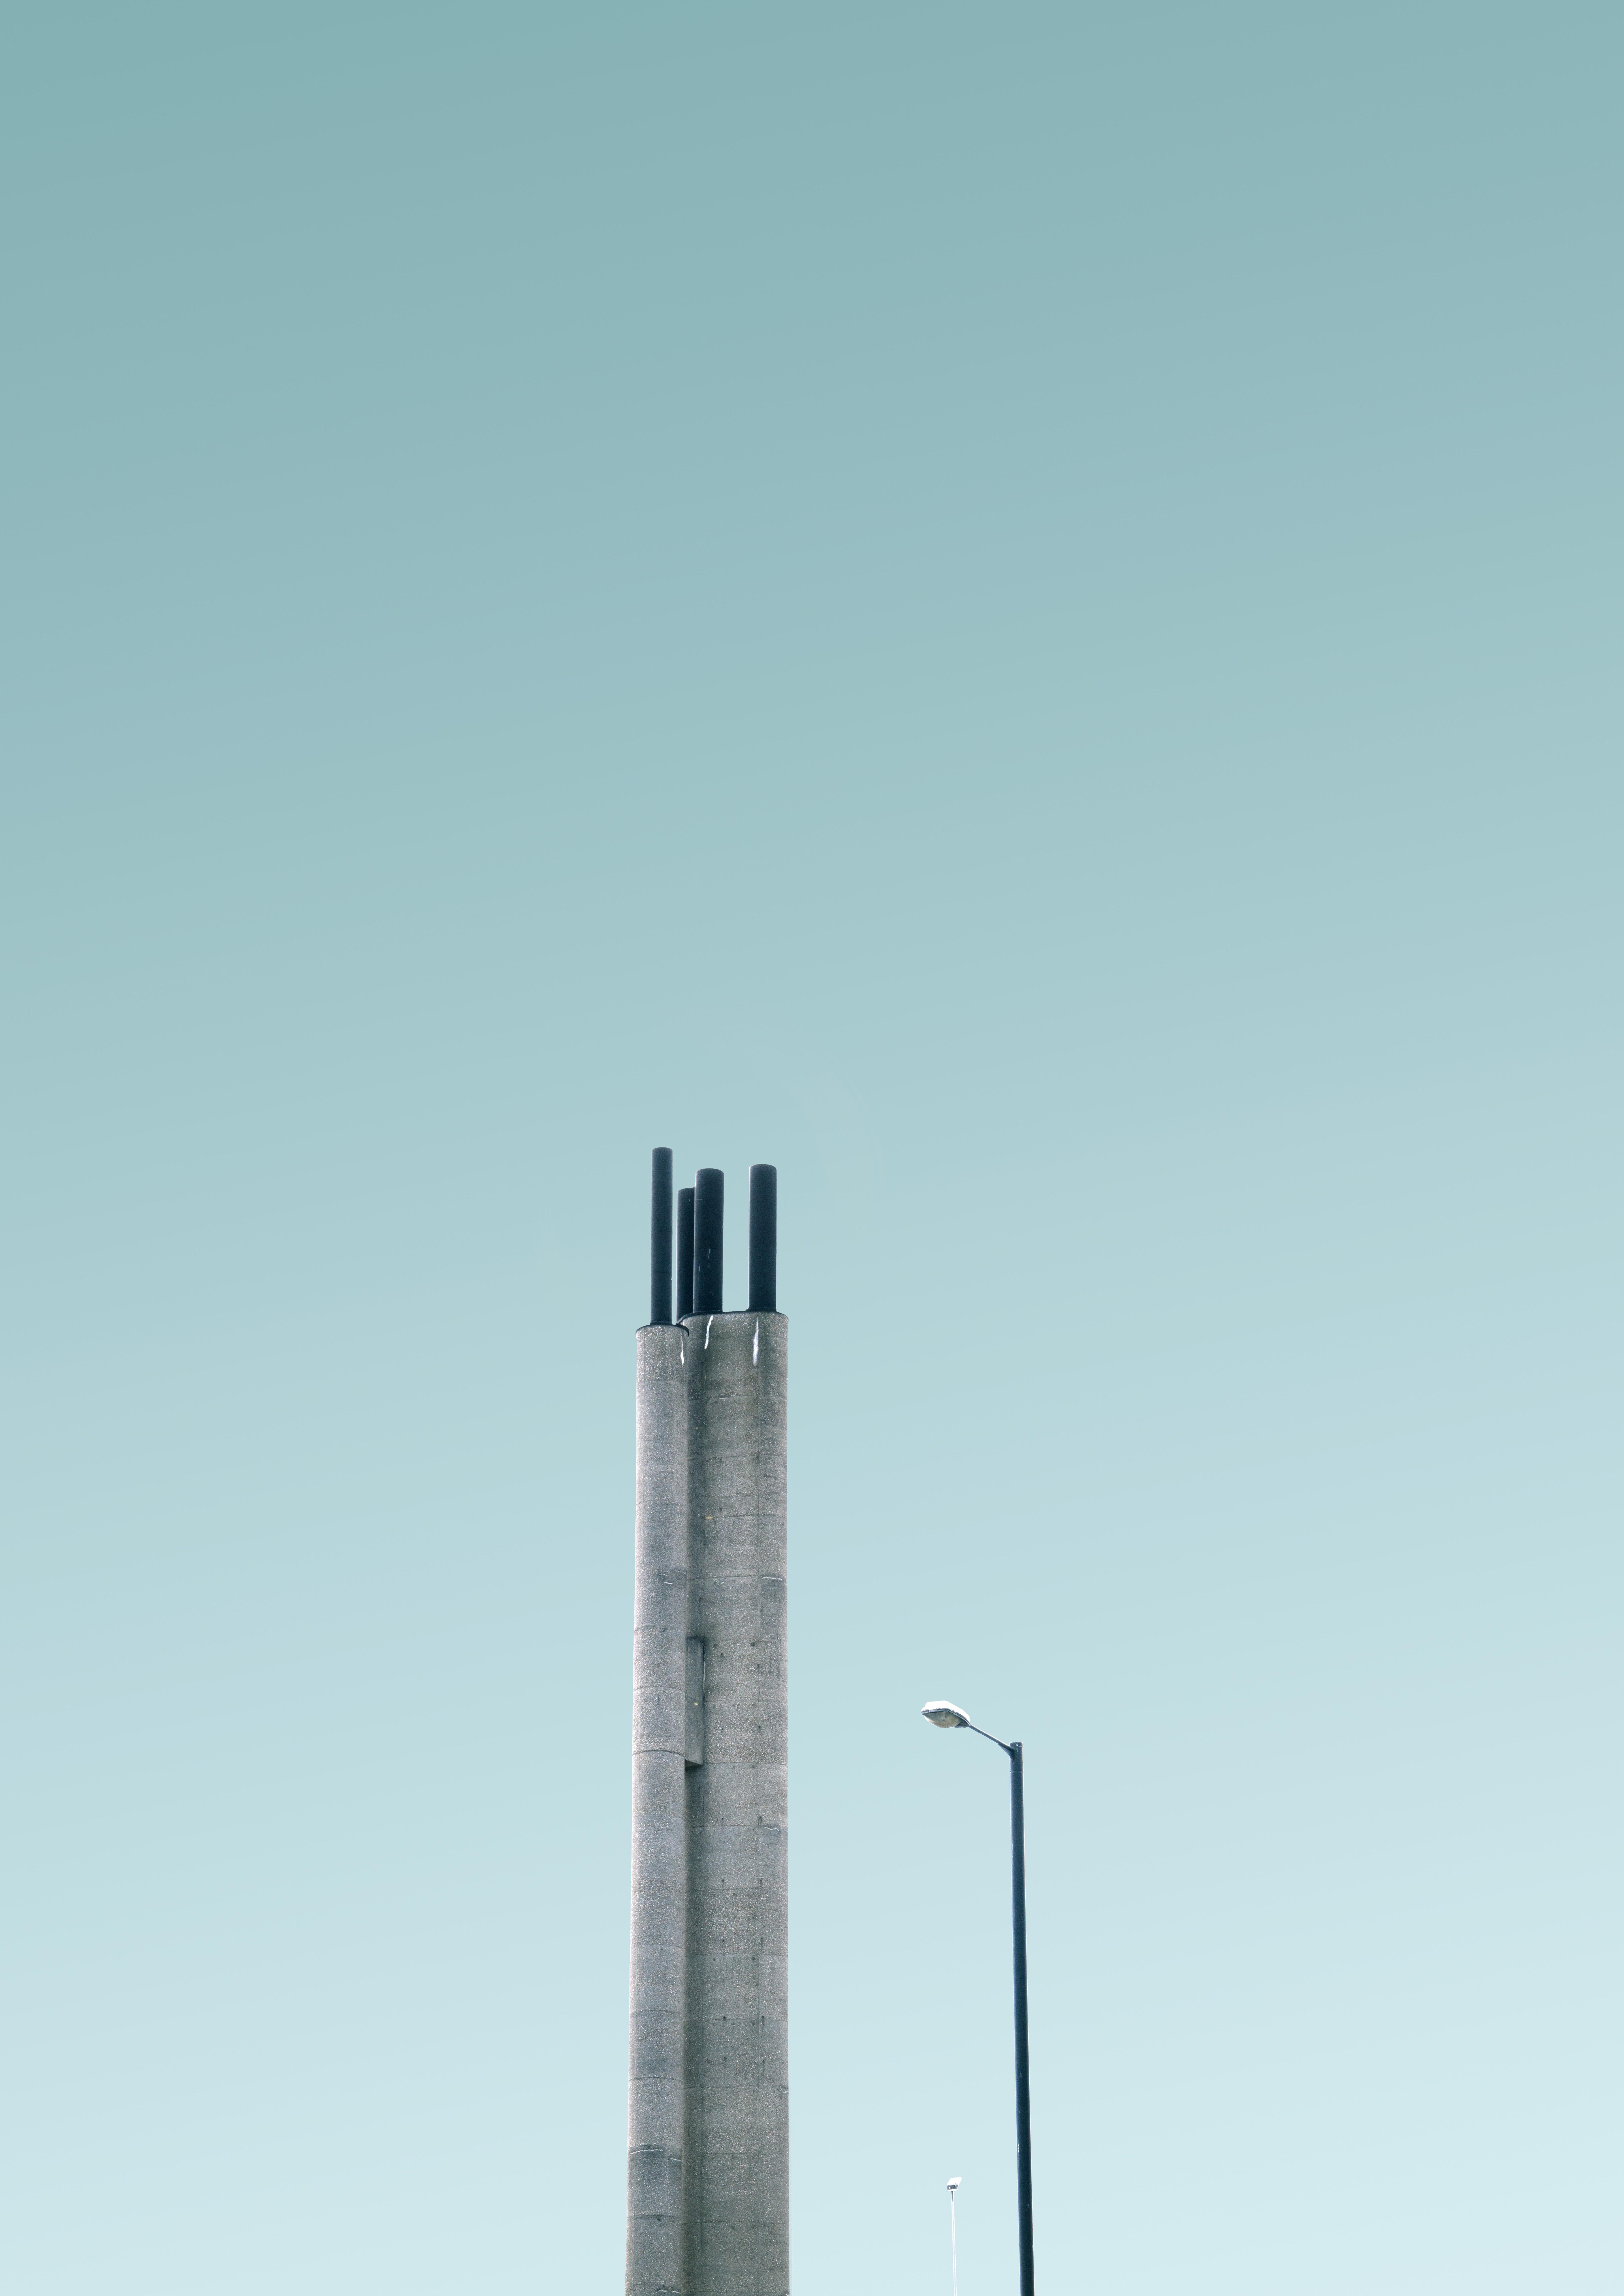 gray metal light post